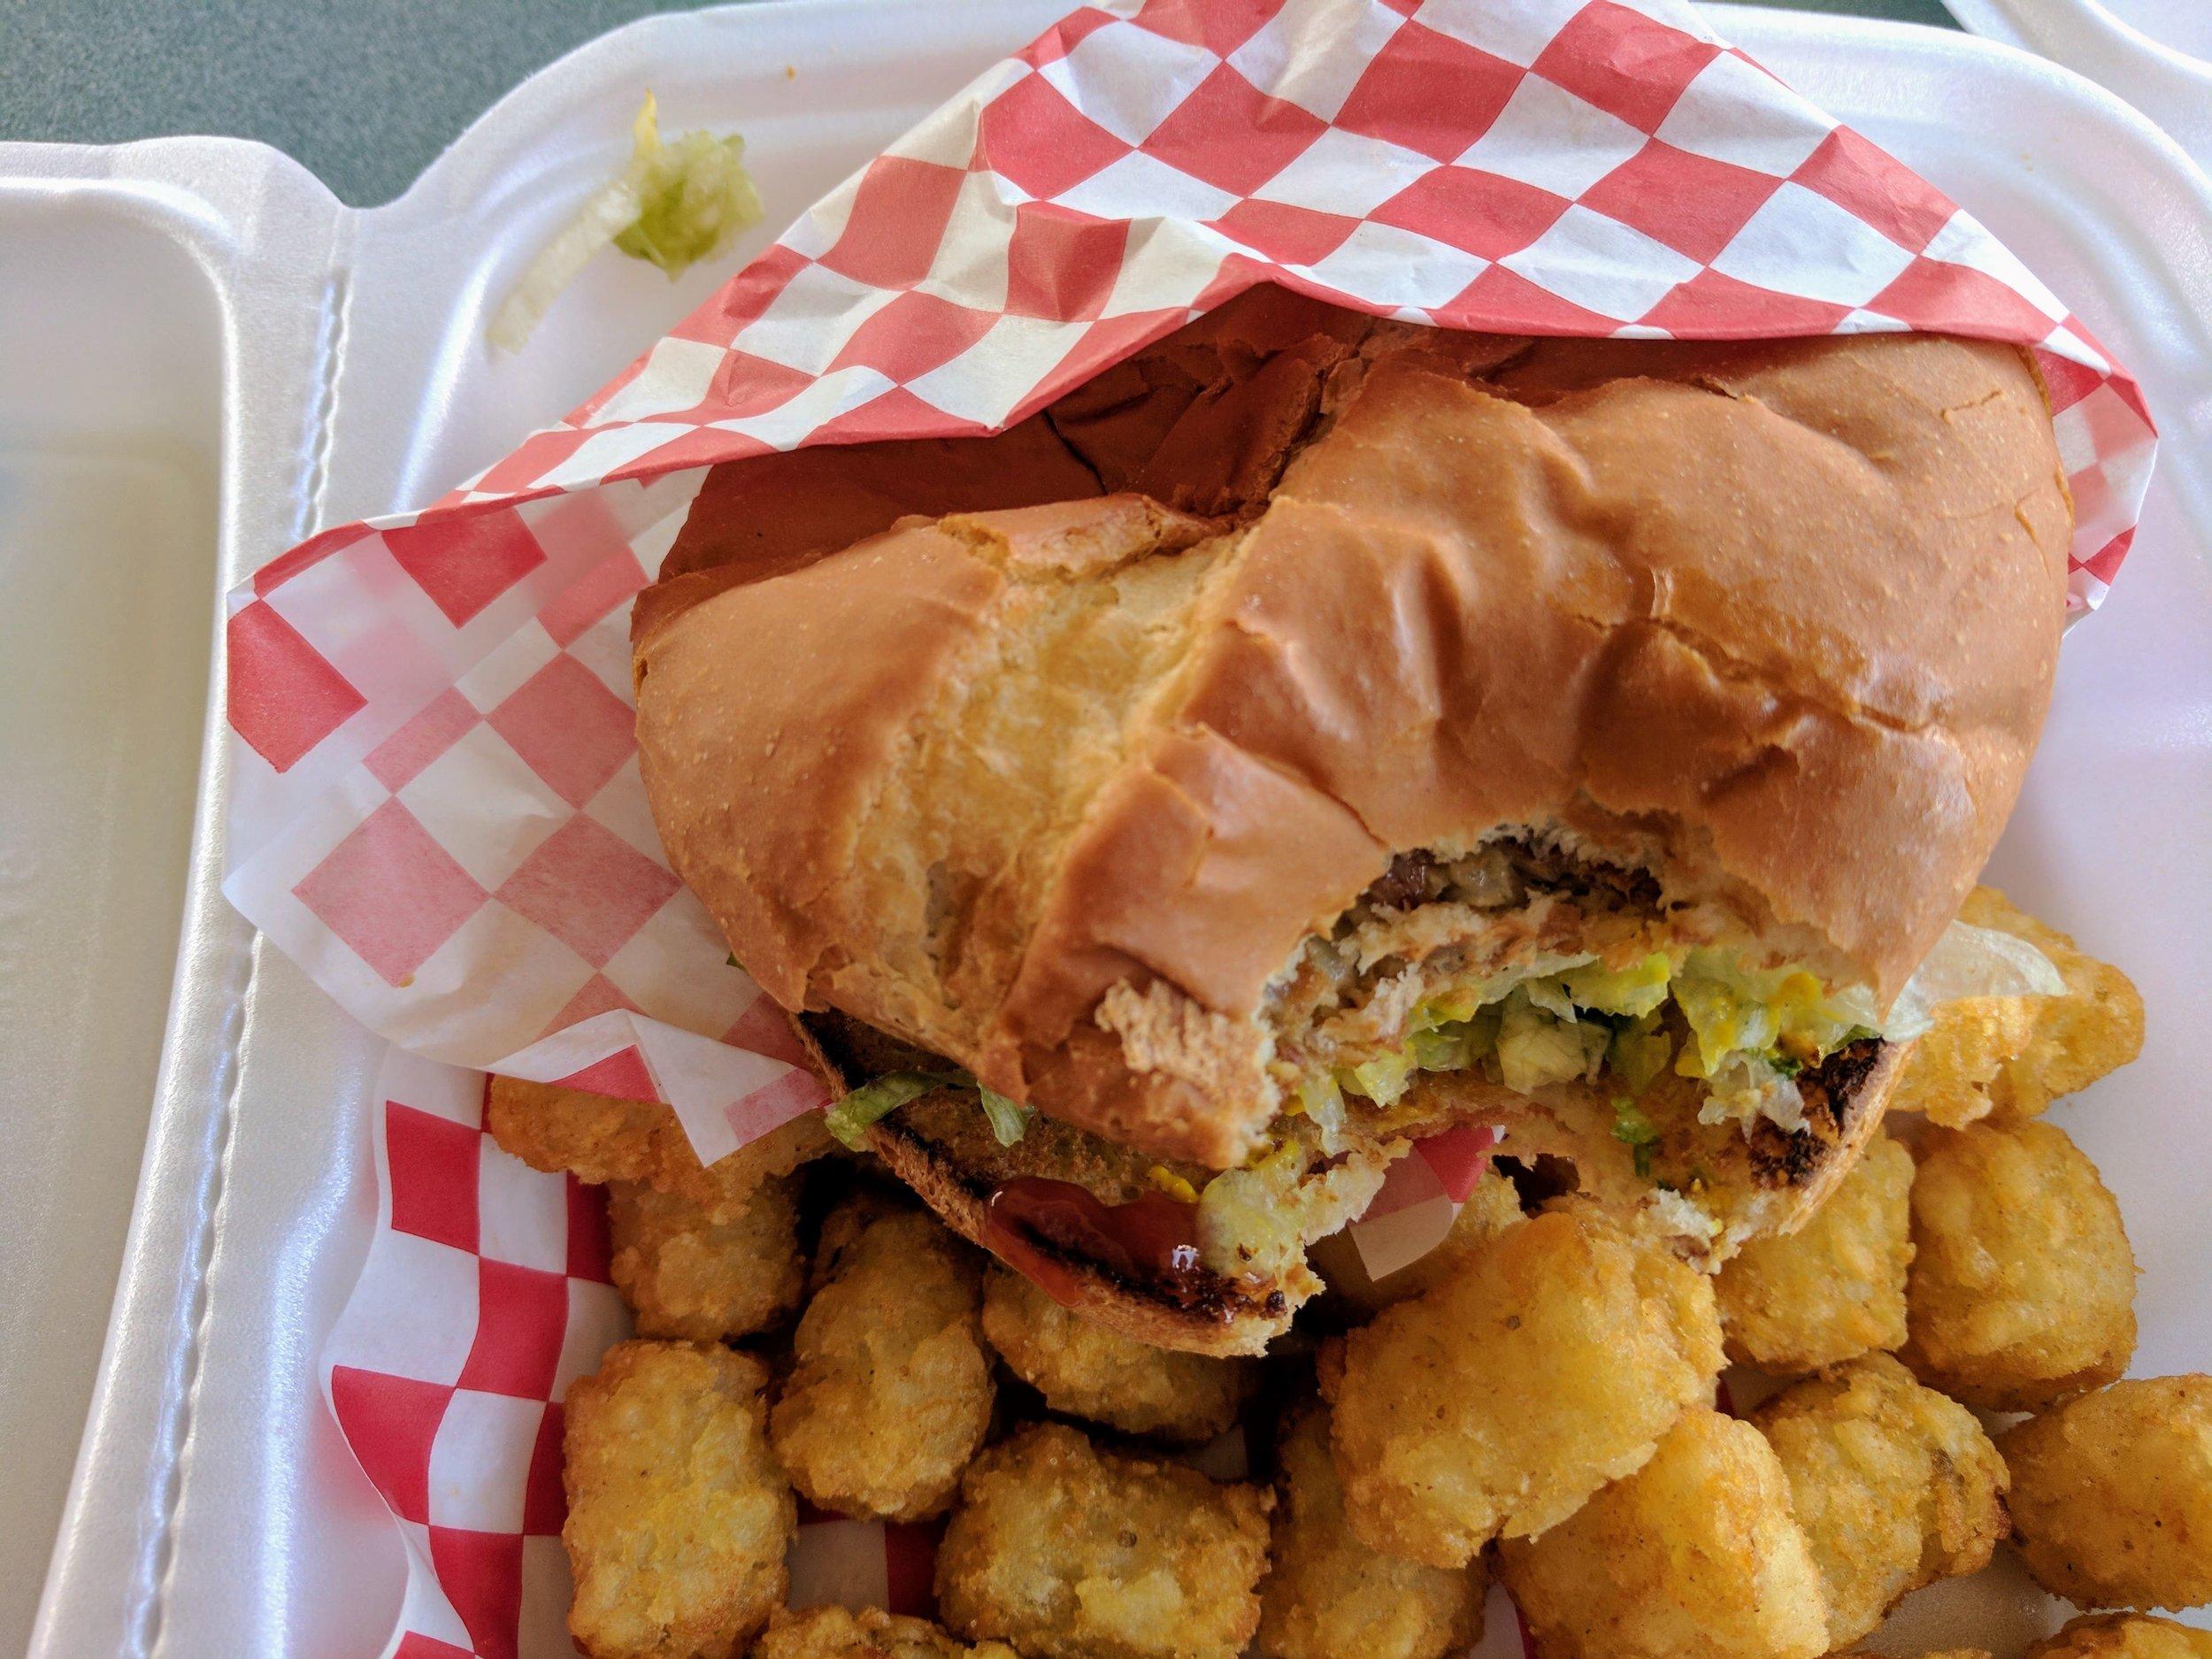 Garden Burger at Blustery's